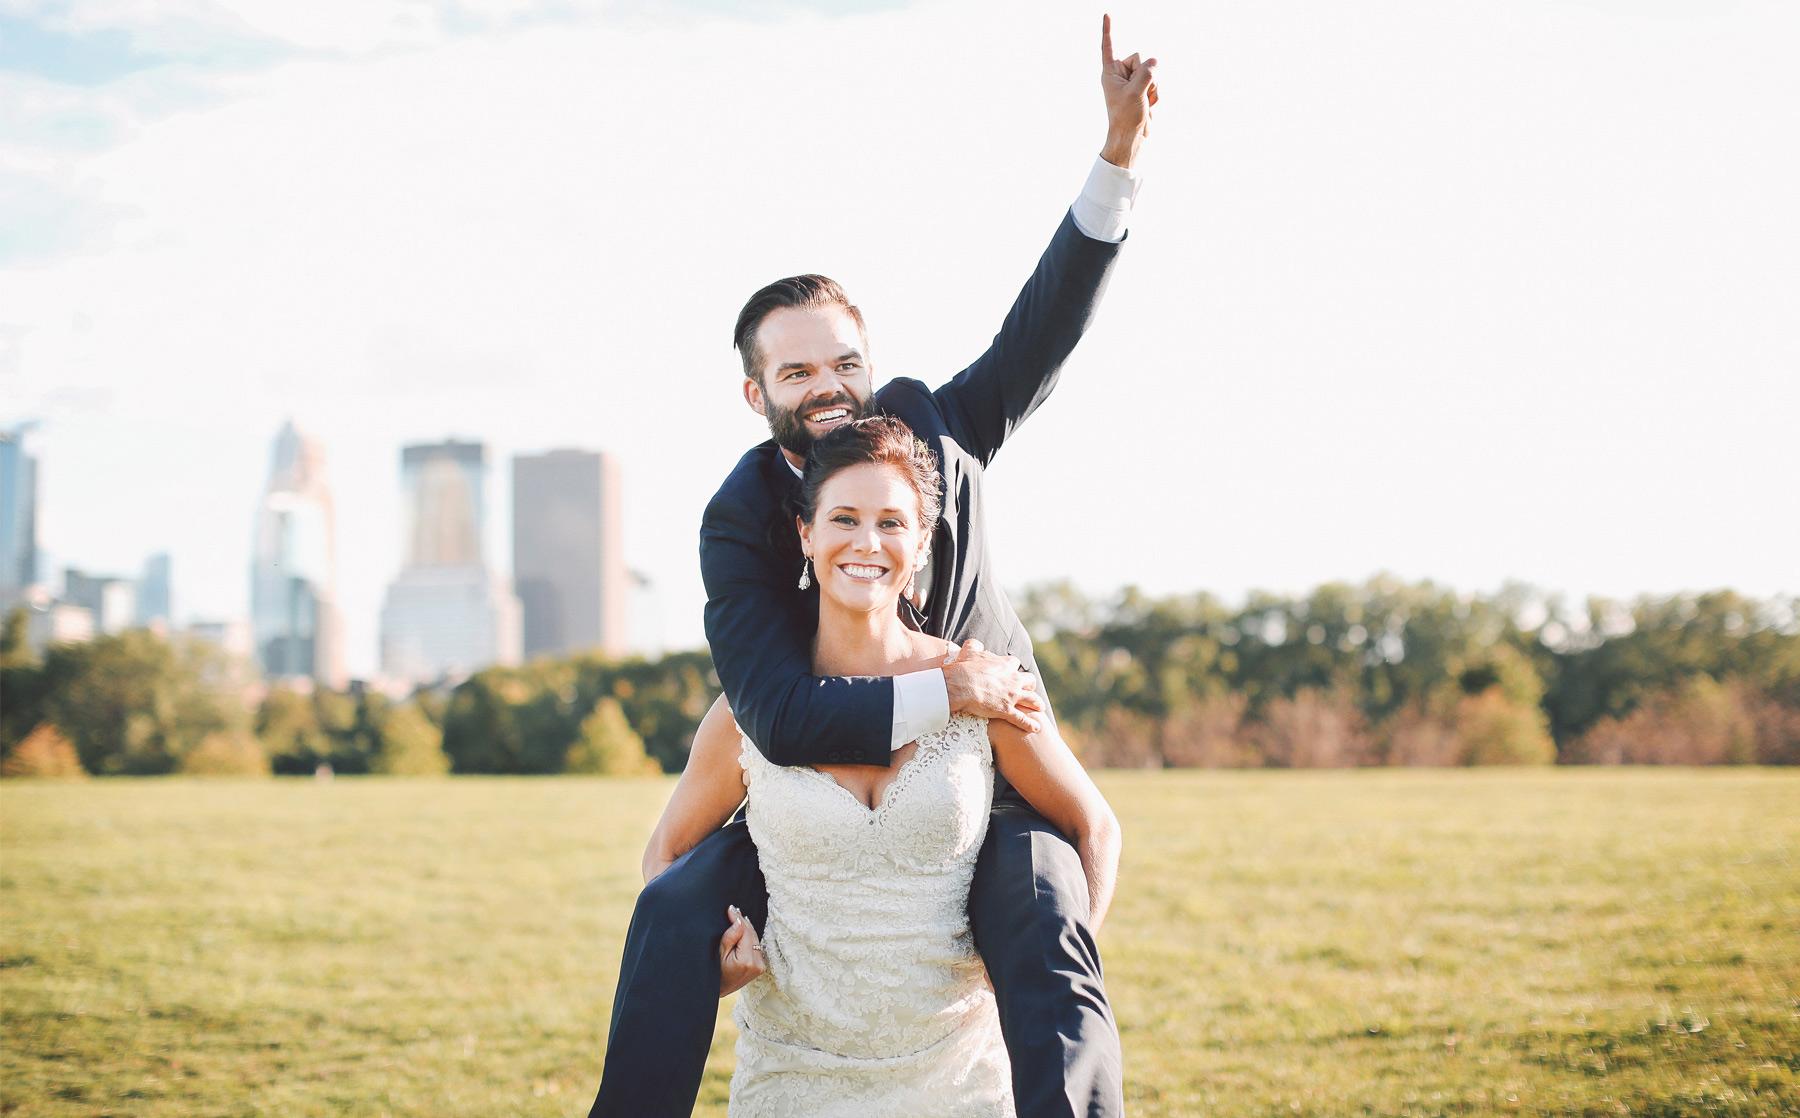 22-Minneapolis-Minnesota-Wedding-Photographer-by-Andrew-Vick-Photography-Summer-Boom-Island-Park-Bride-Groom-Piggyback-Ride-Vintage-Ashley-and-Eric.jpg